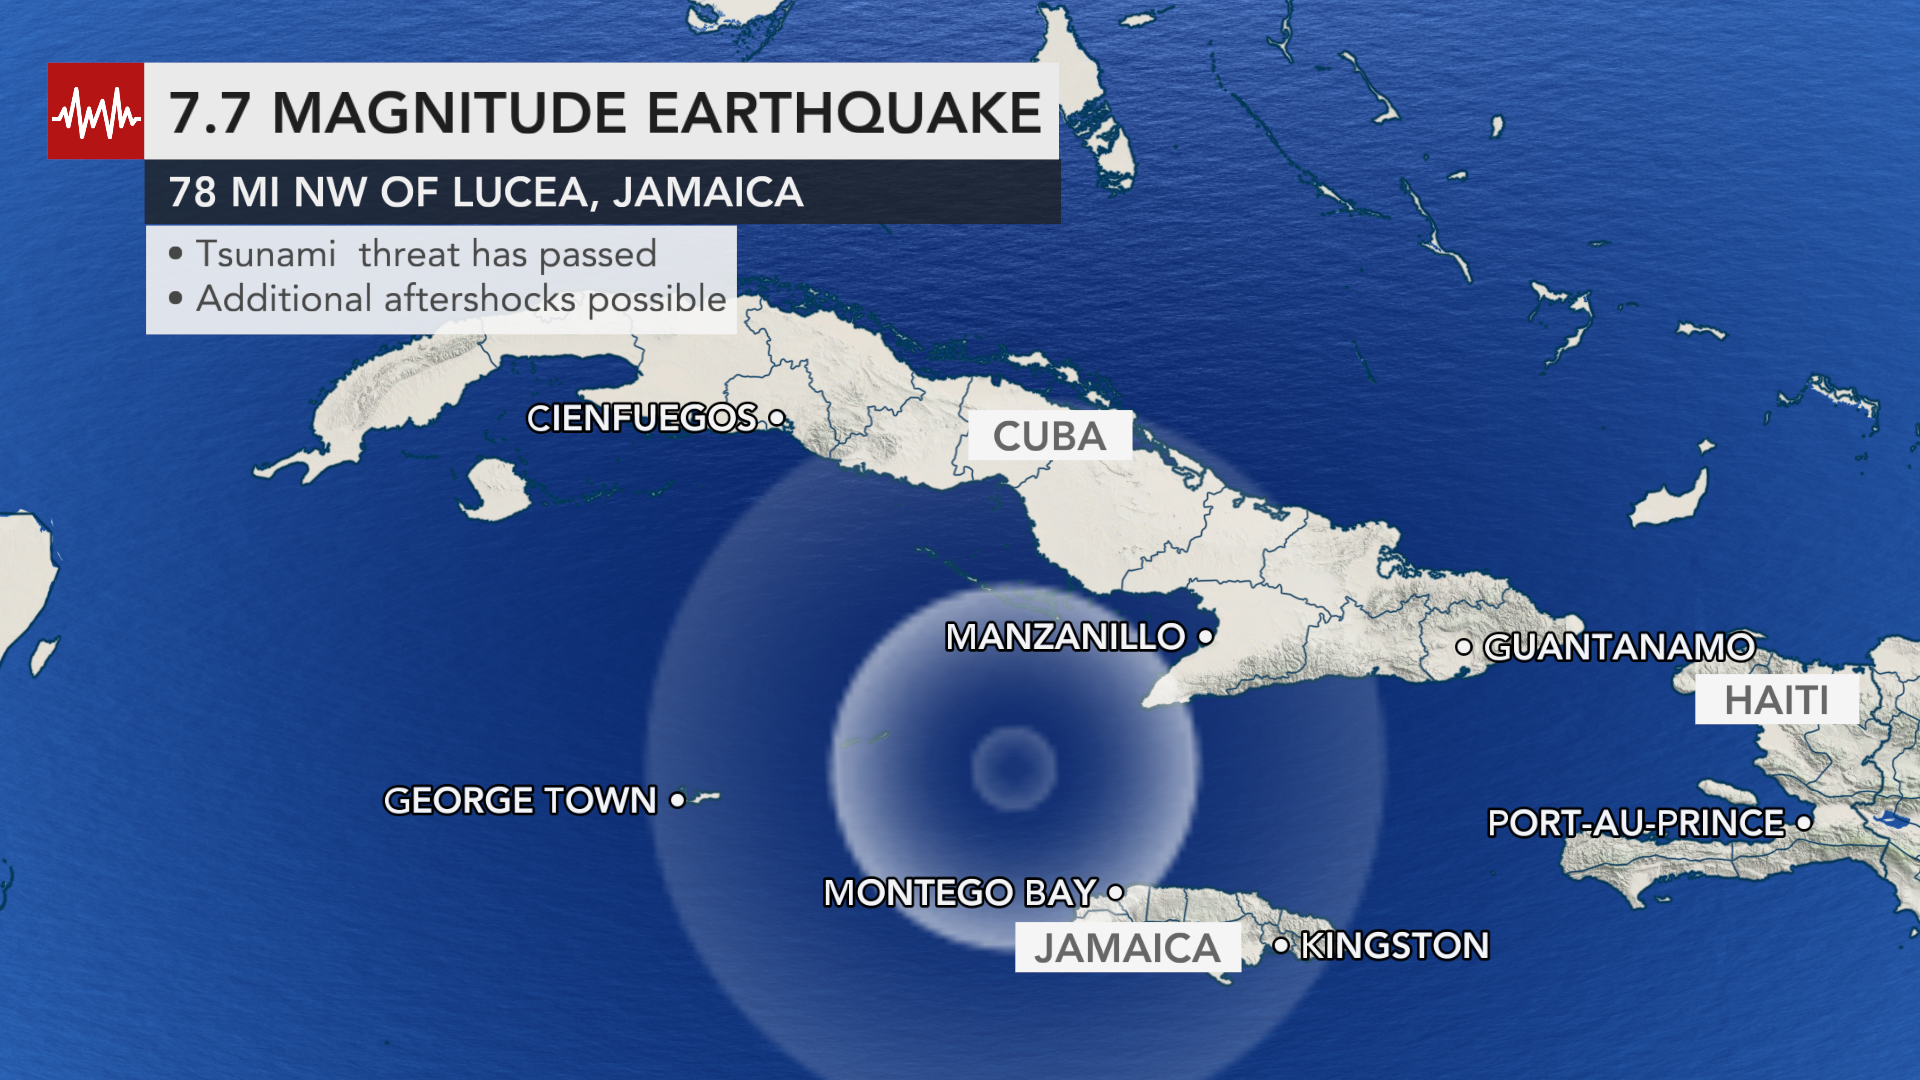 Magnitude 7 7 Earthquake Jolts Caribbean Sparks Tsunami Fears Throughout Region Accuweather